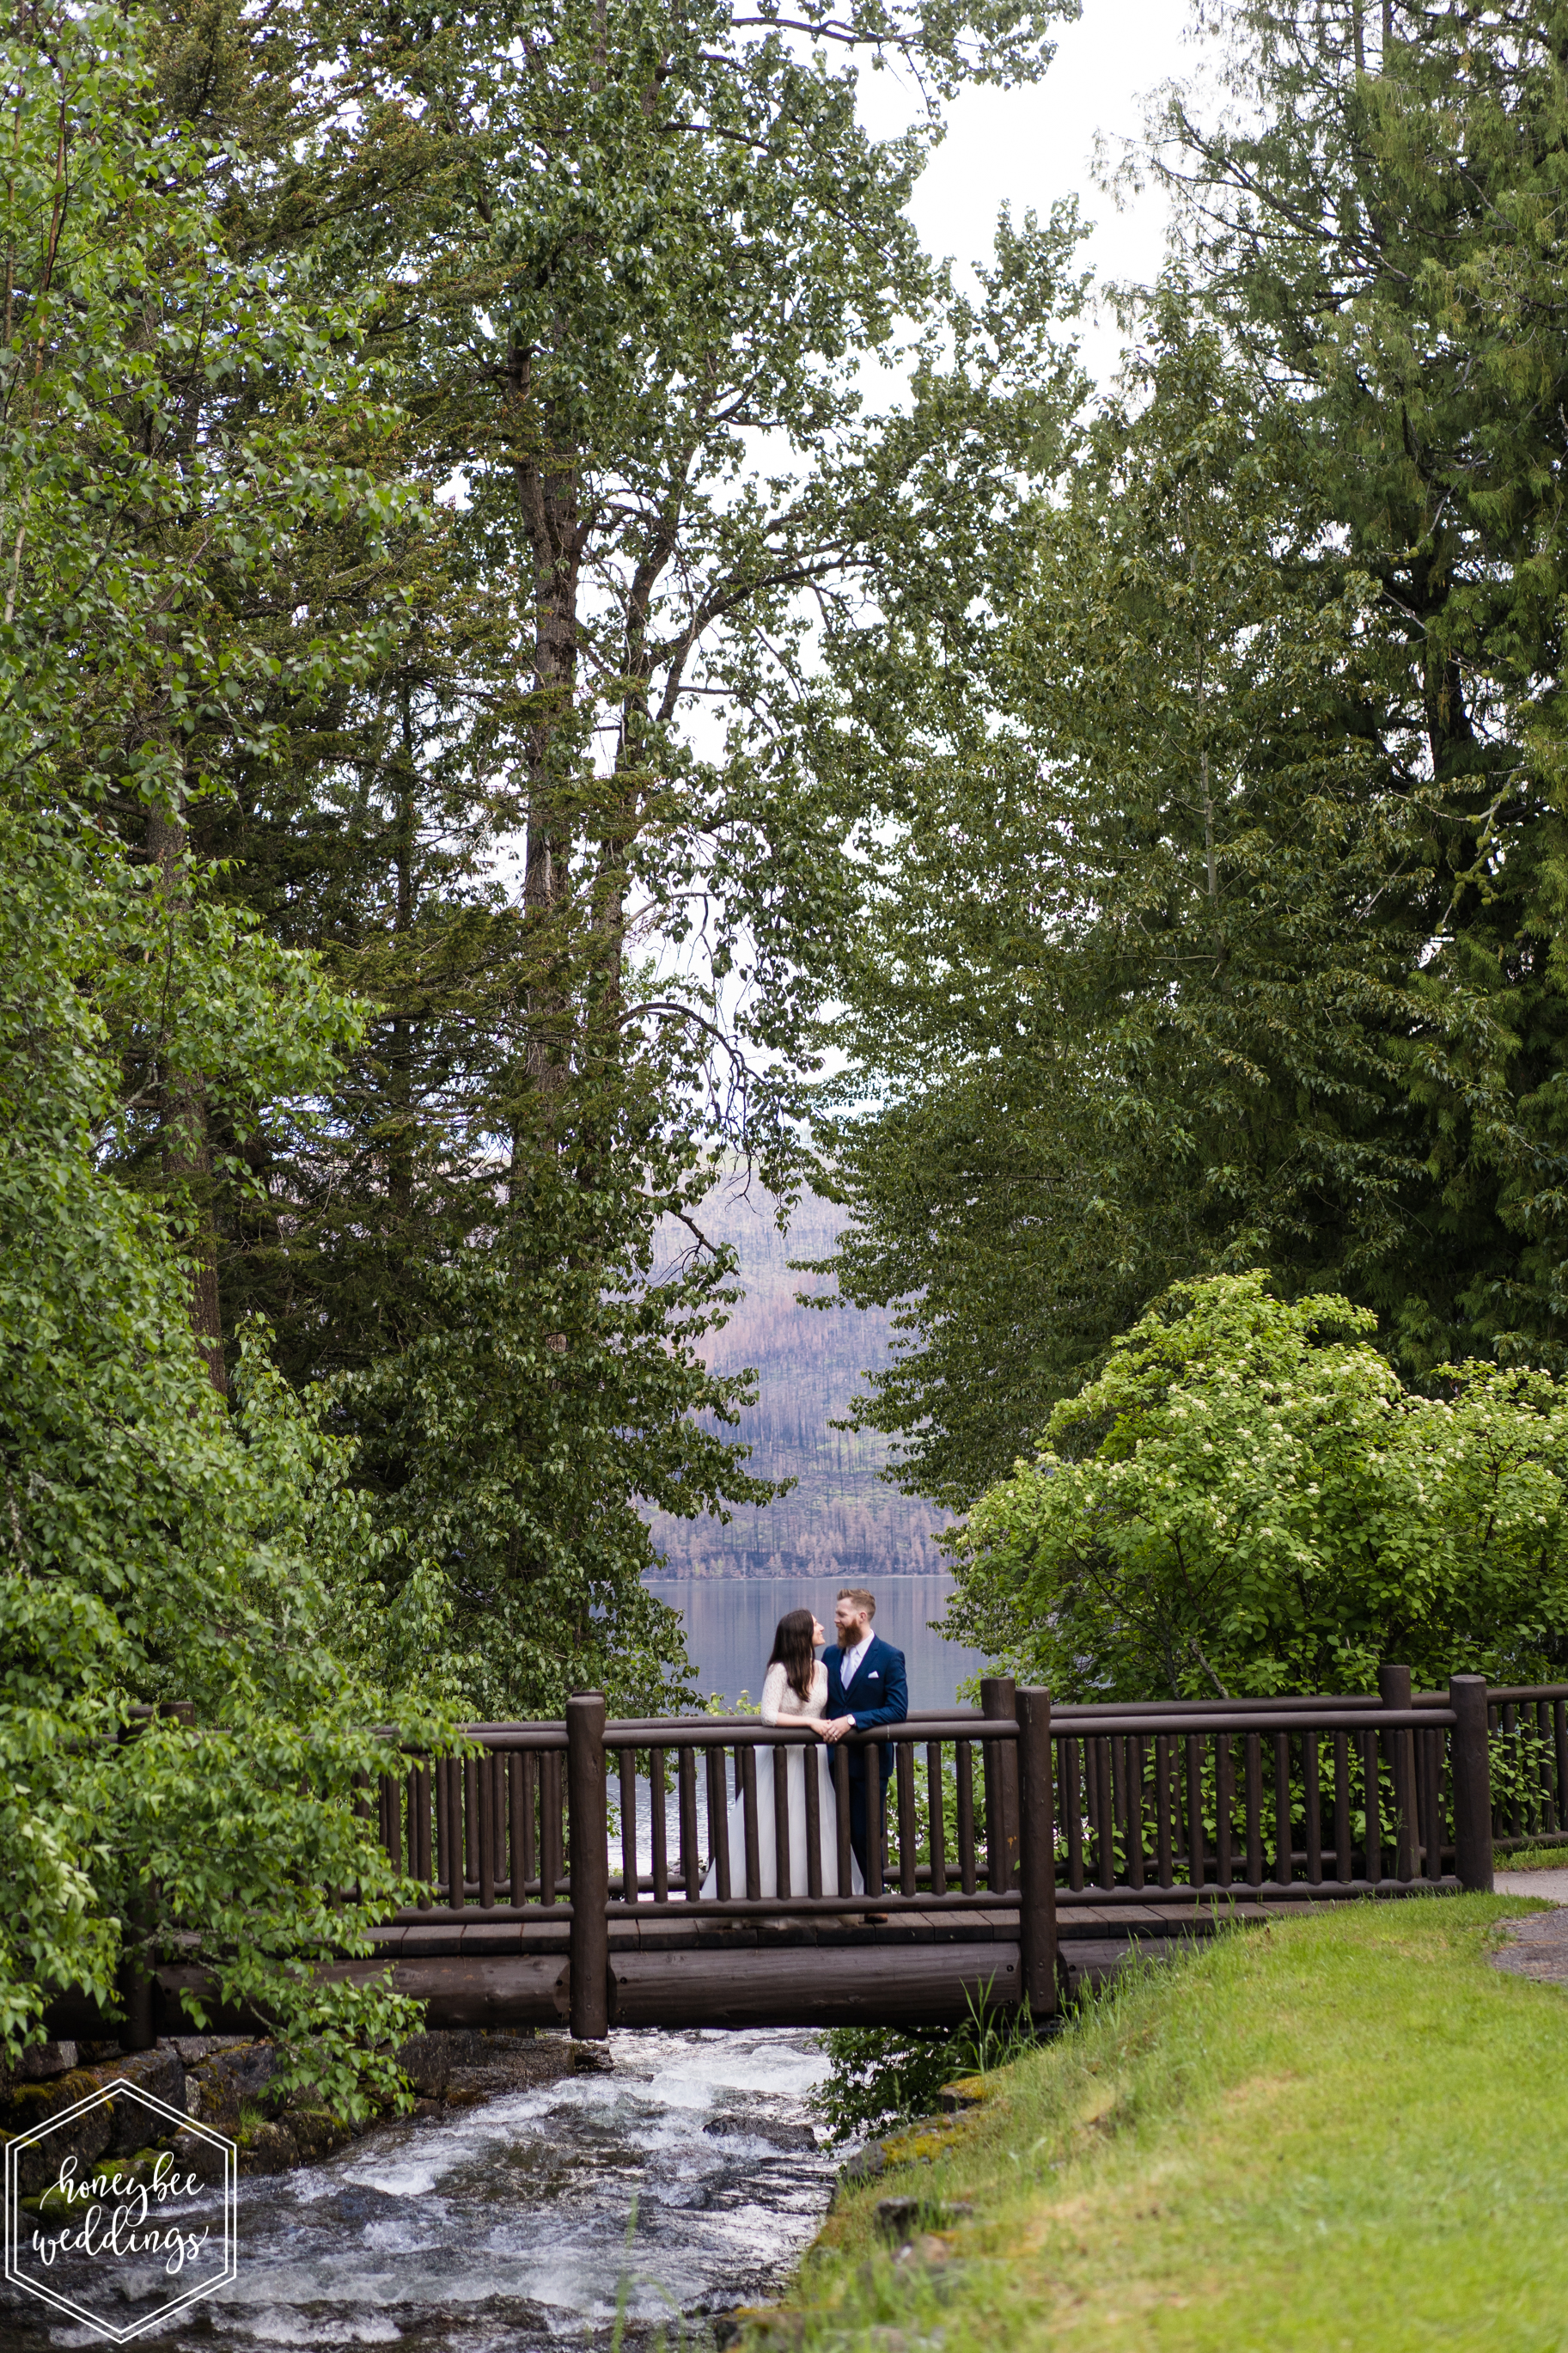 259Glacier National Park Wedding_Izaak Walton Inn Wedding_Honeybee Weddings_Norah & Kyle_June 09, 2019-93.jpg